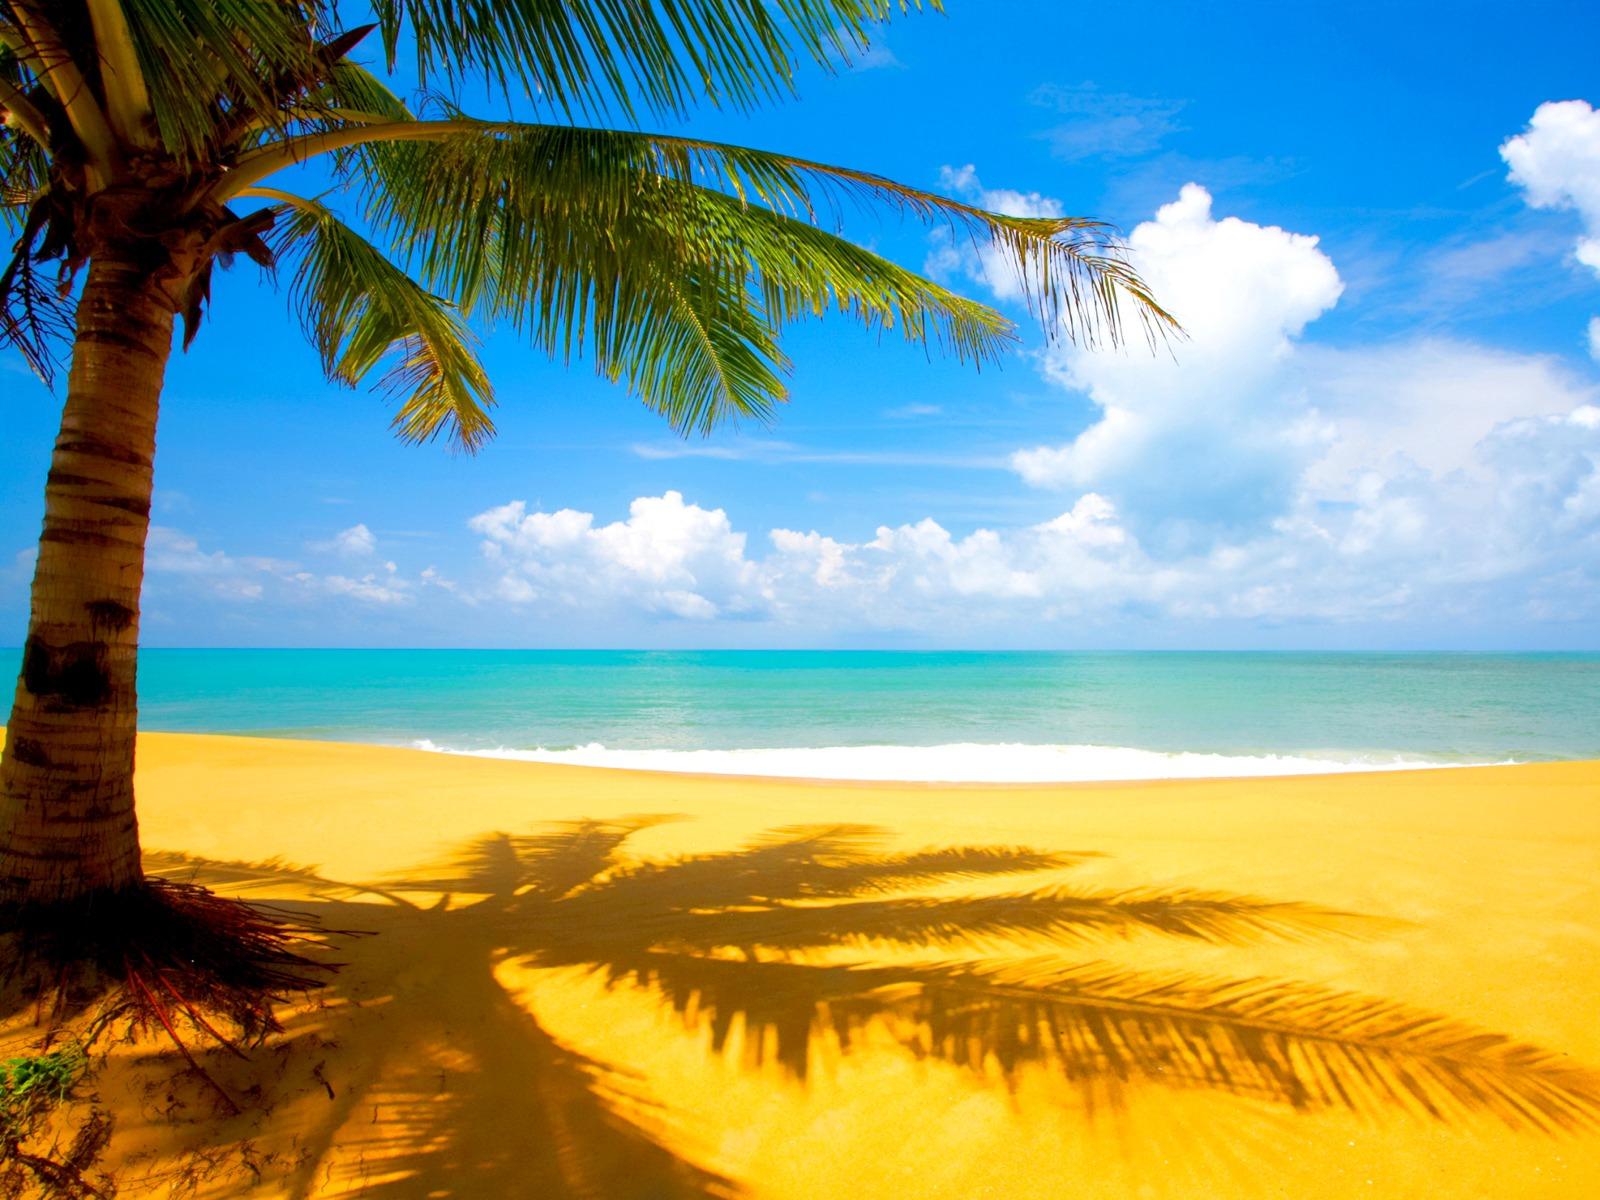 Beach Wallpaper Amazing Landscape